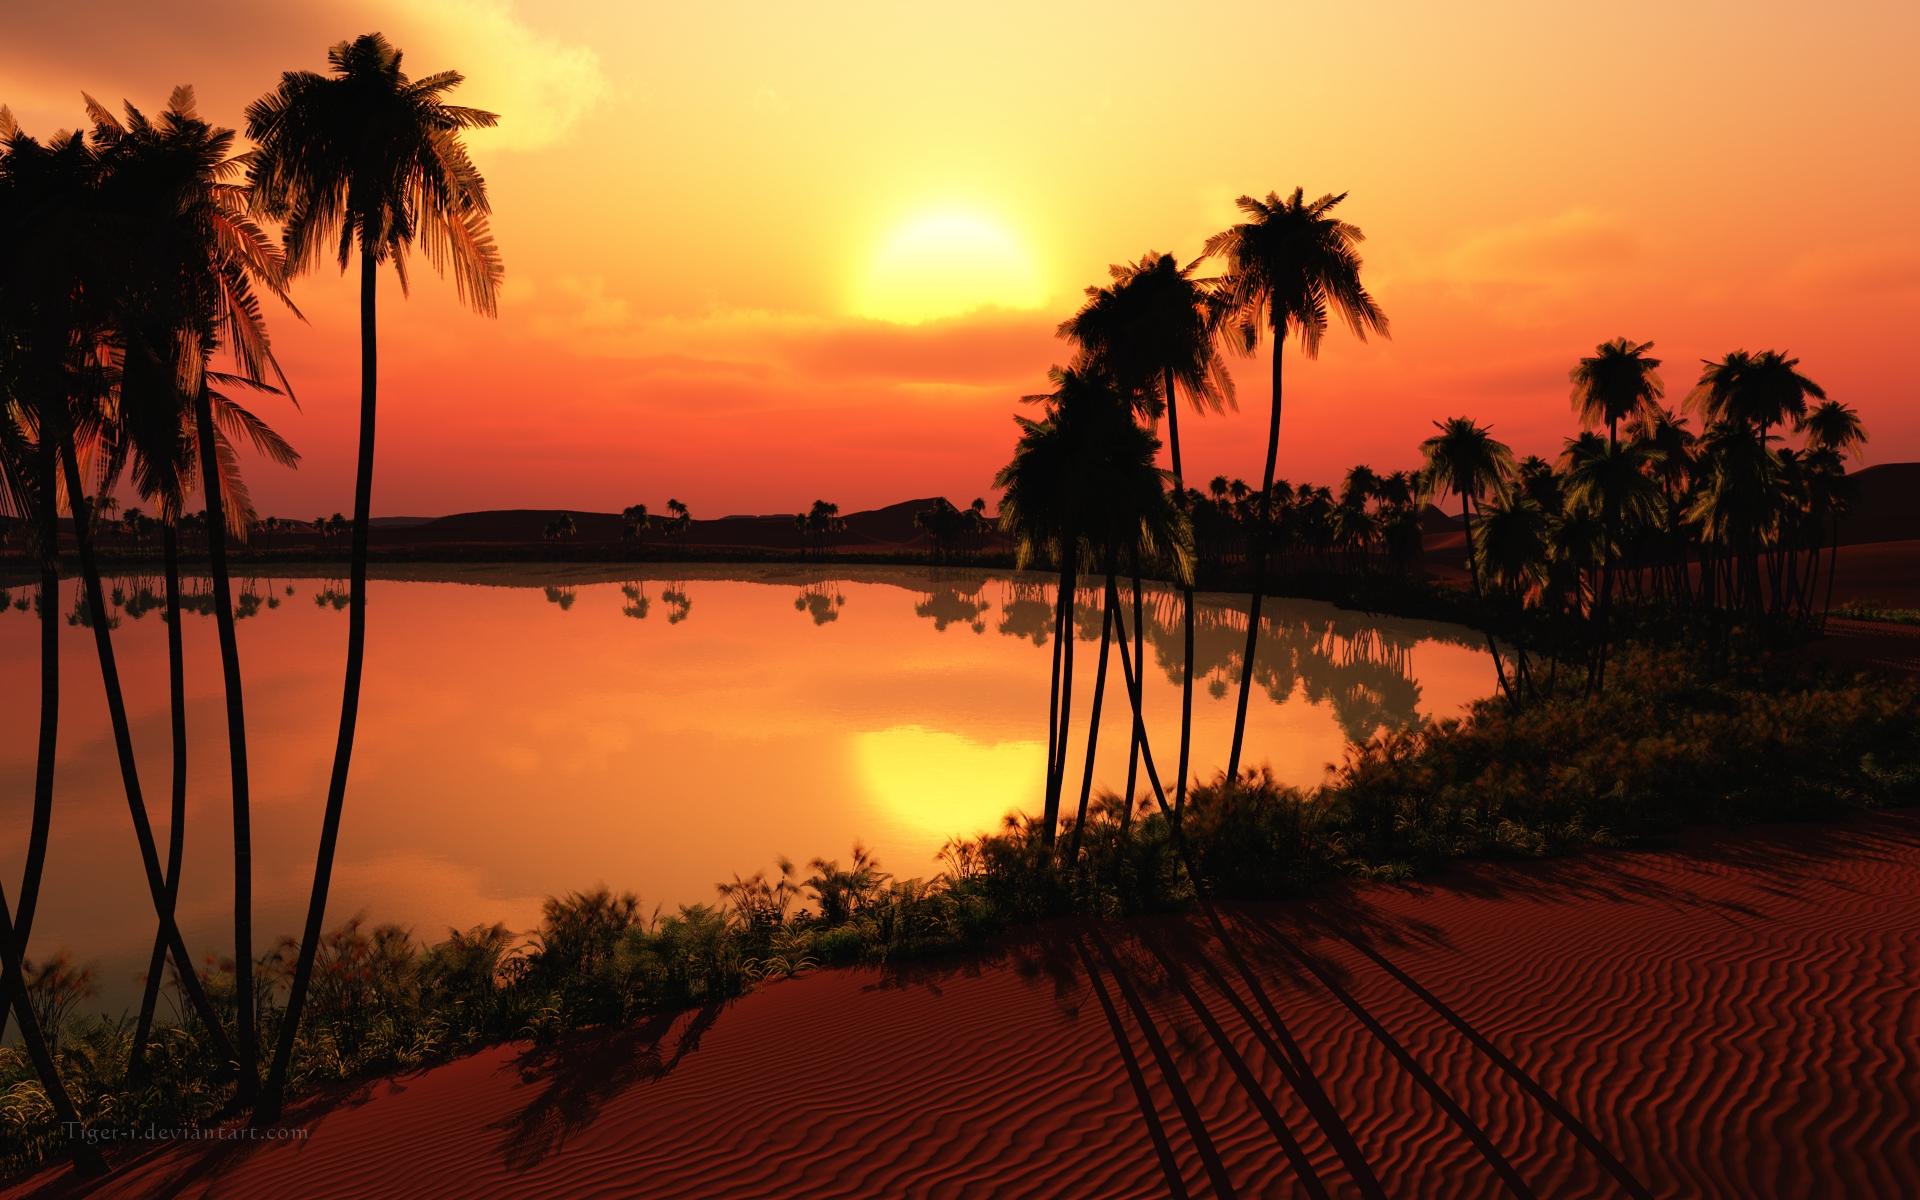 Oasis Sunset With Palm Trees desktop wallpaper WallpaperPixel 1920x1200